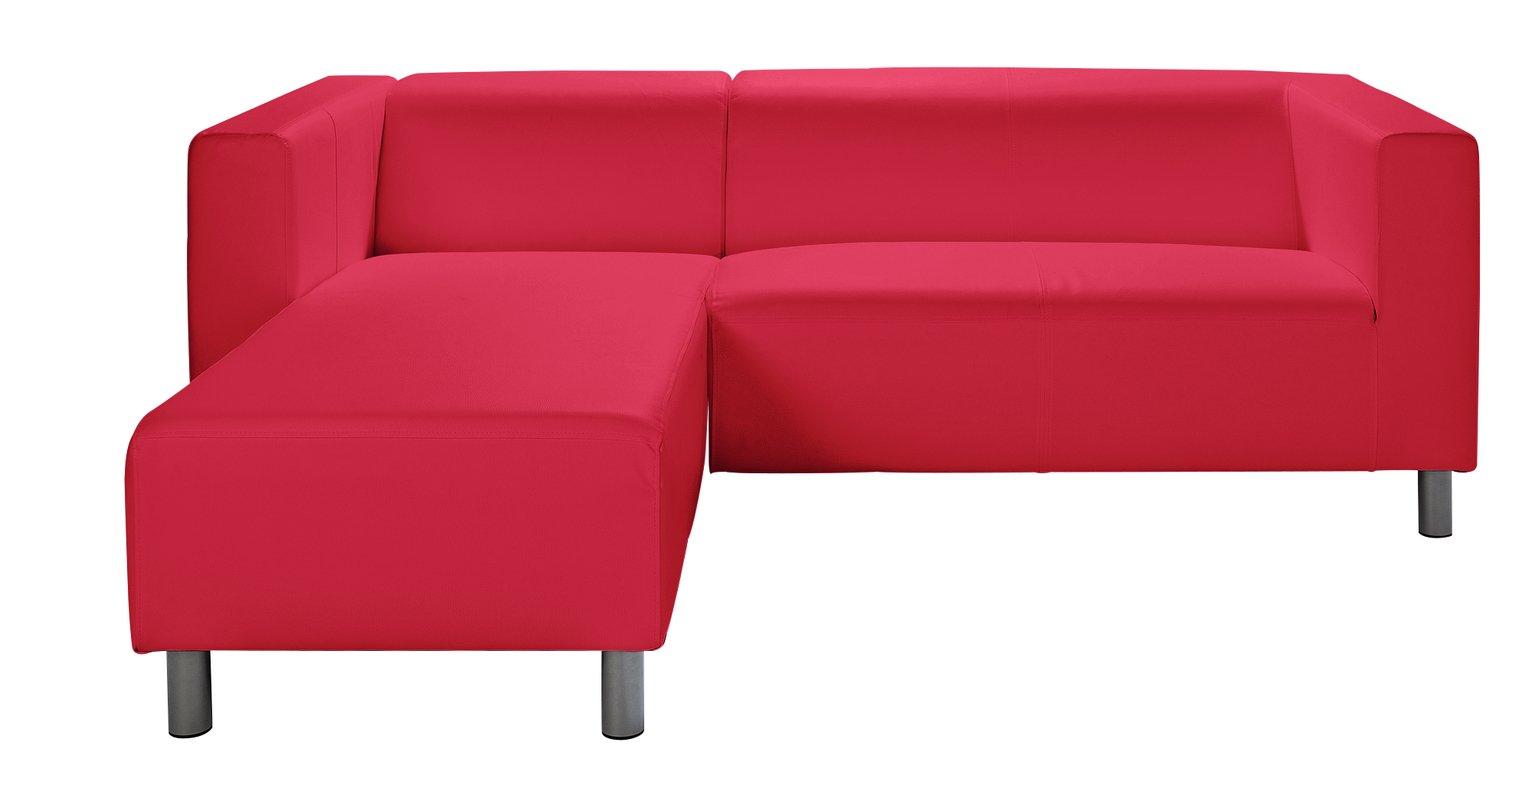 Argos Home Moda Compact Left Corner Faux Leather Sofa - Red